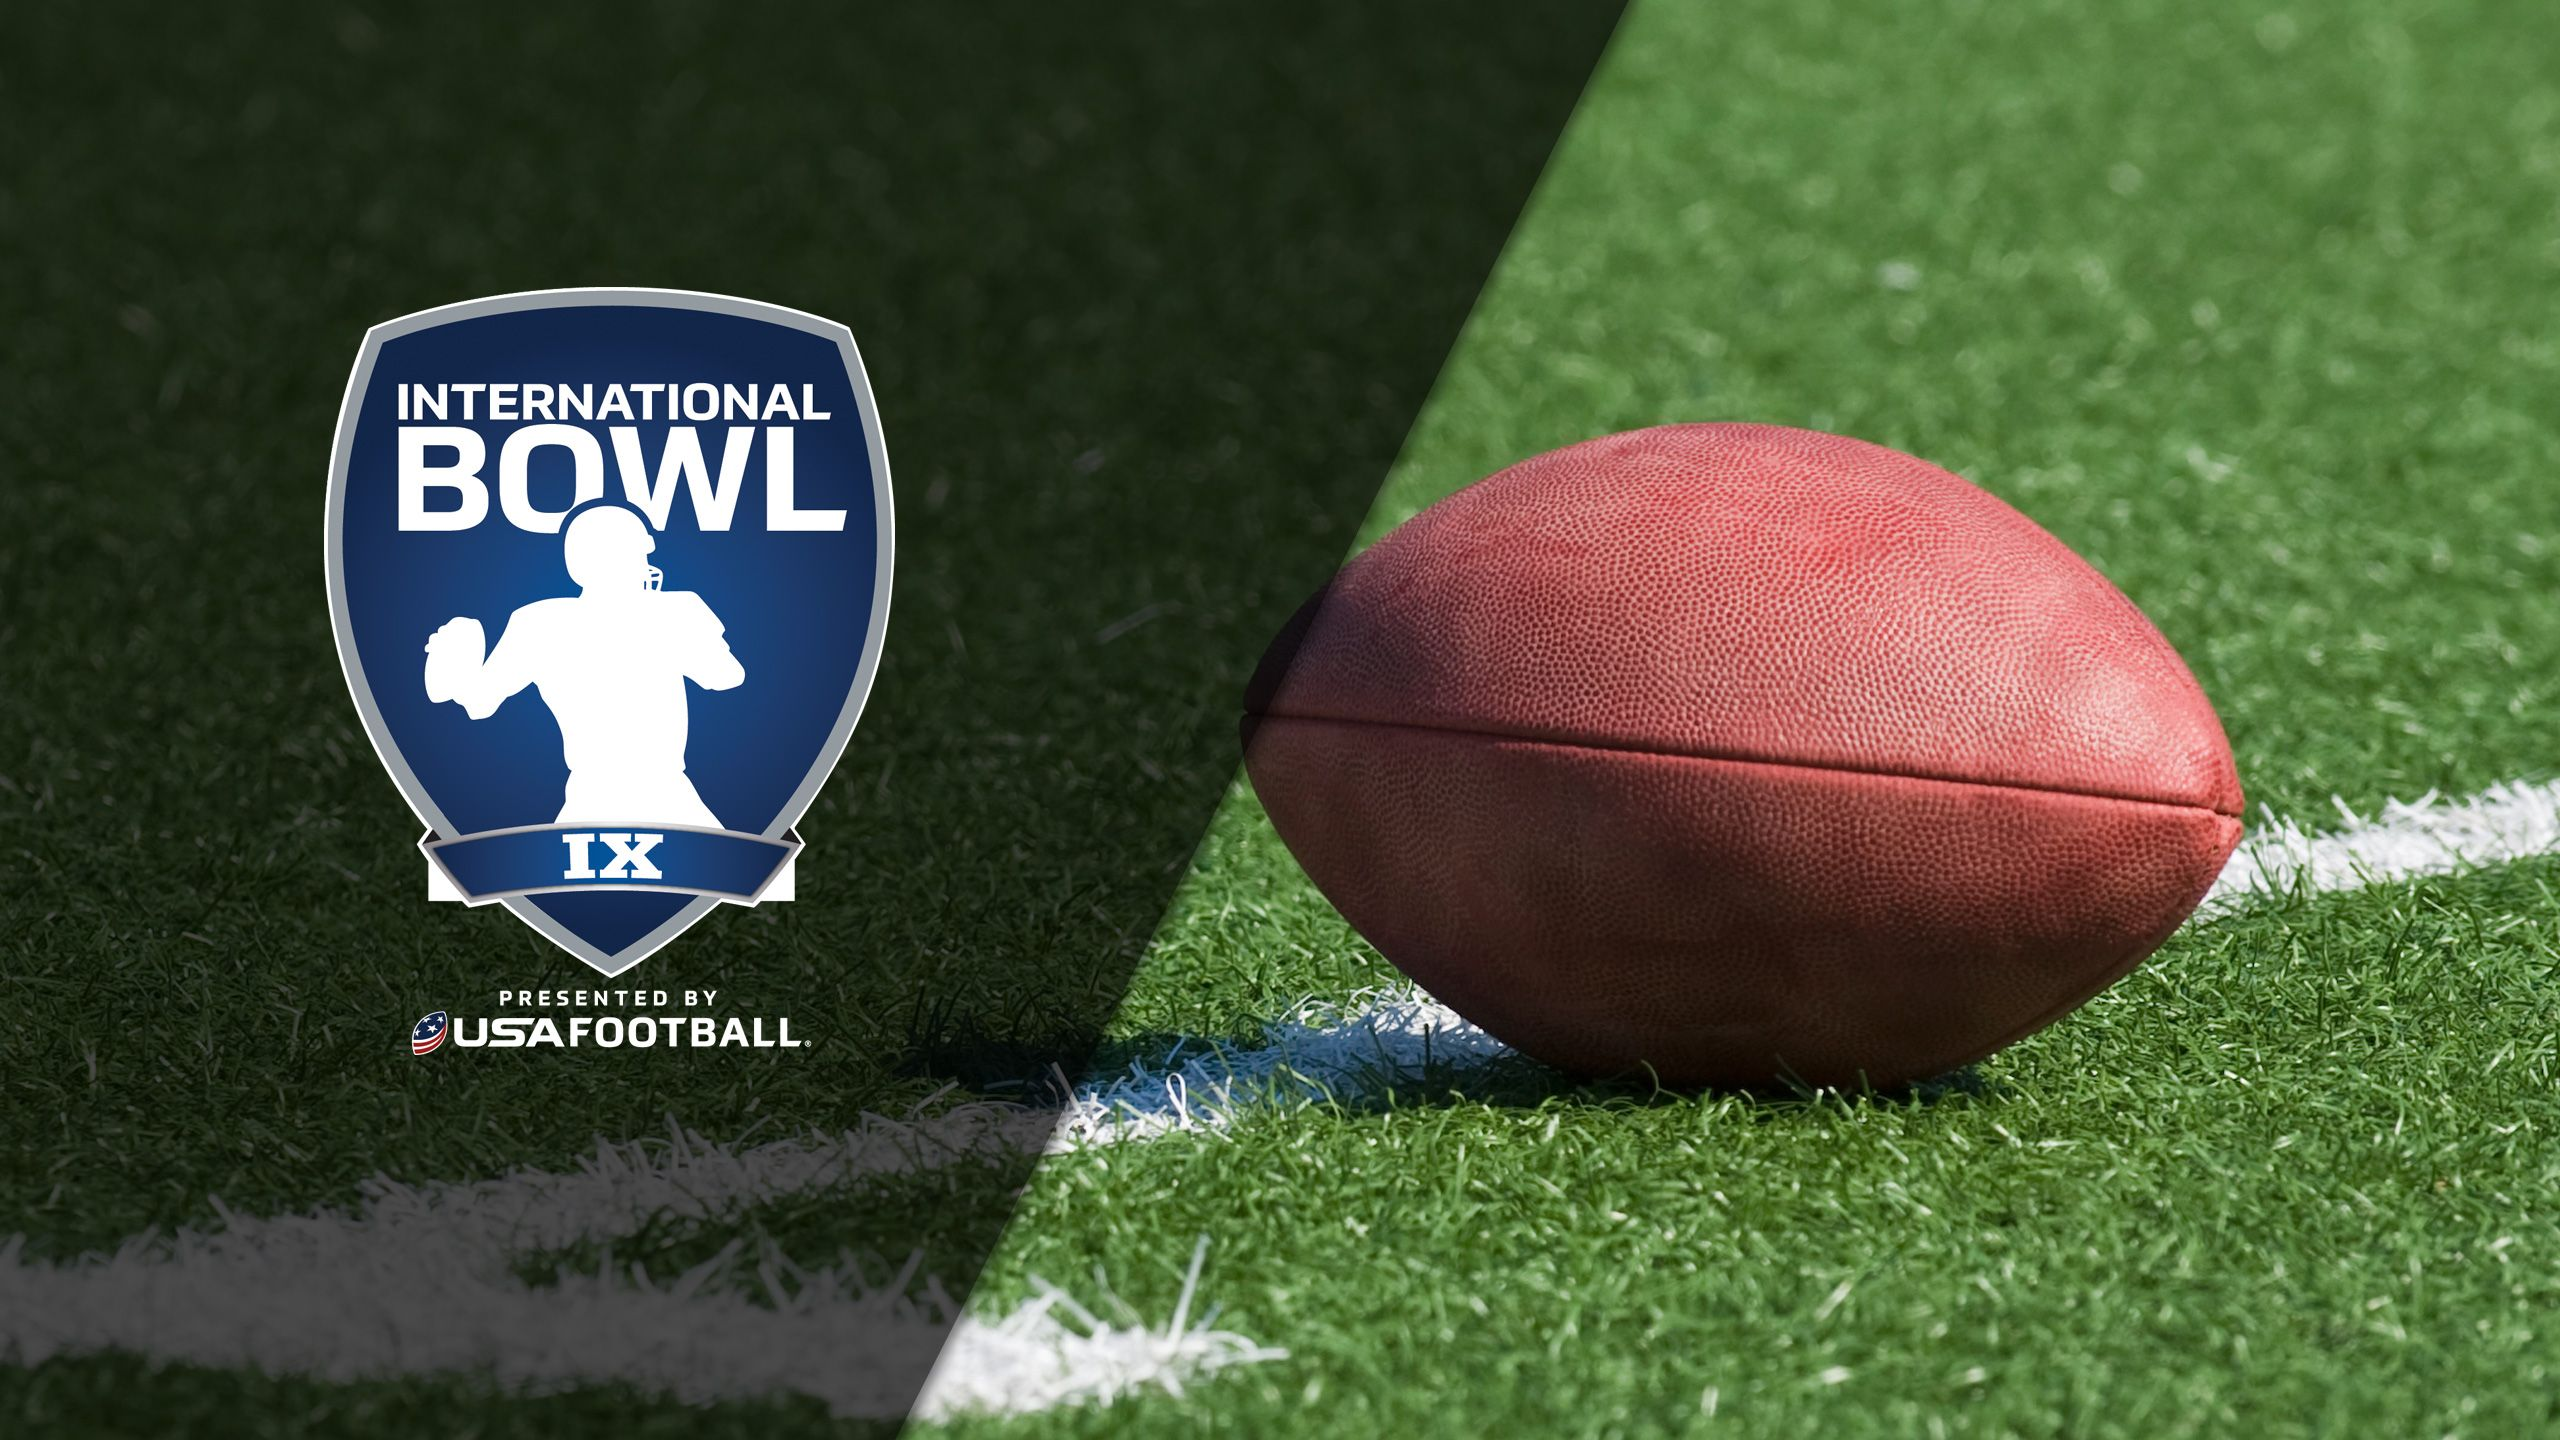 U.S. Under-15 Stars vs. U.S. Under-15 Stripes (International Bowl)